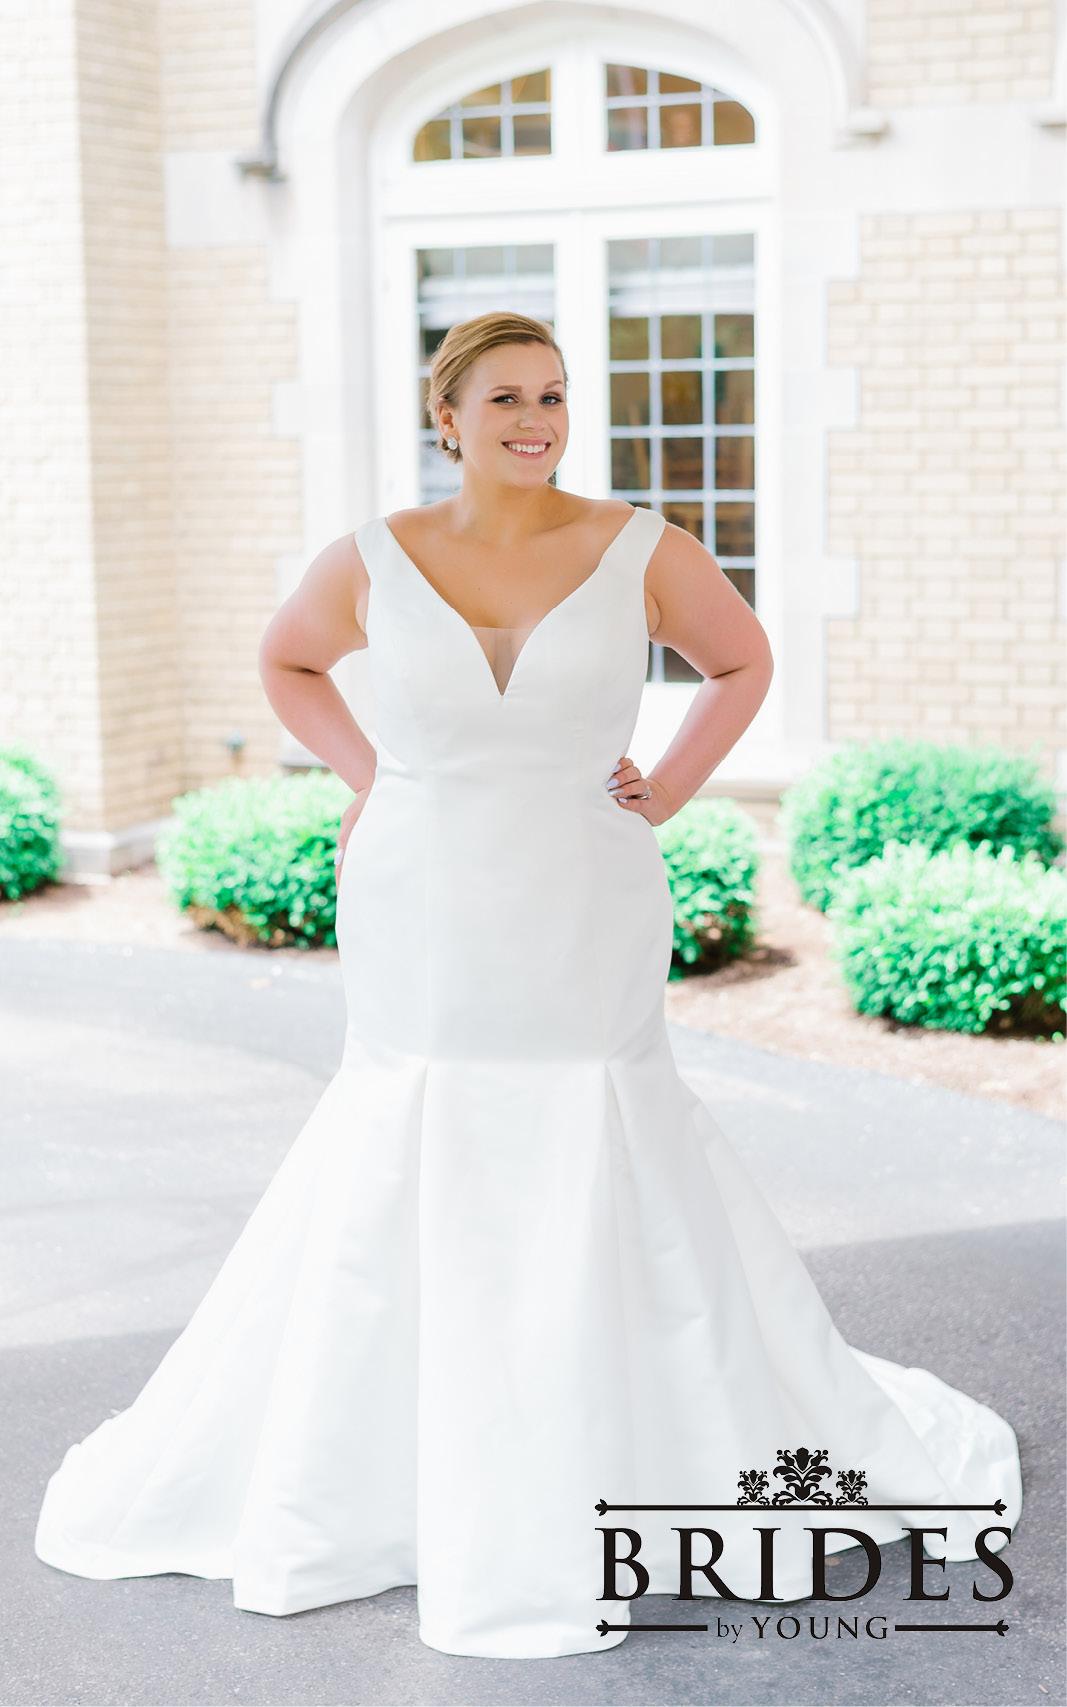 BridesbyYoung-2020Collection-PlusSizeBridalBoutique-CurvyWeddingDressInspiration-190.jpg